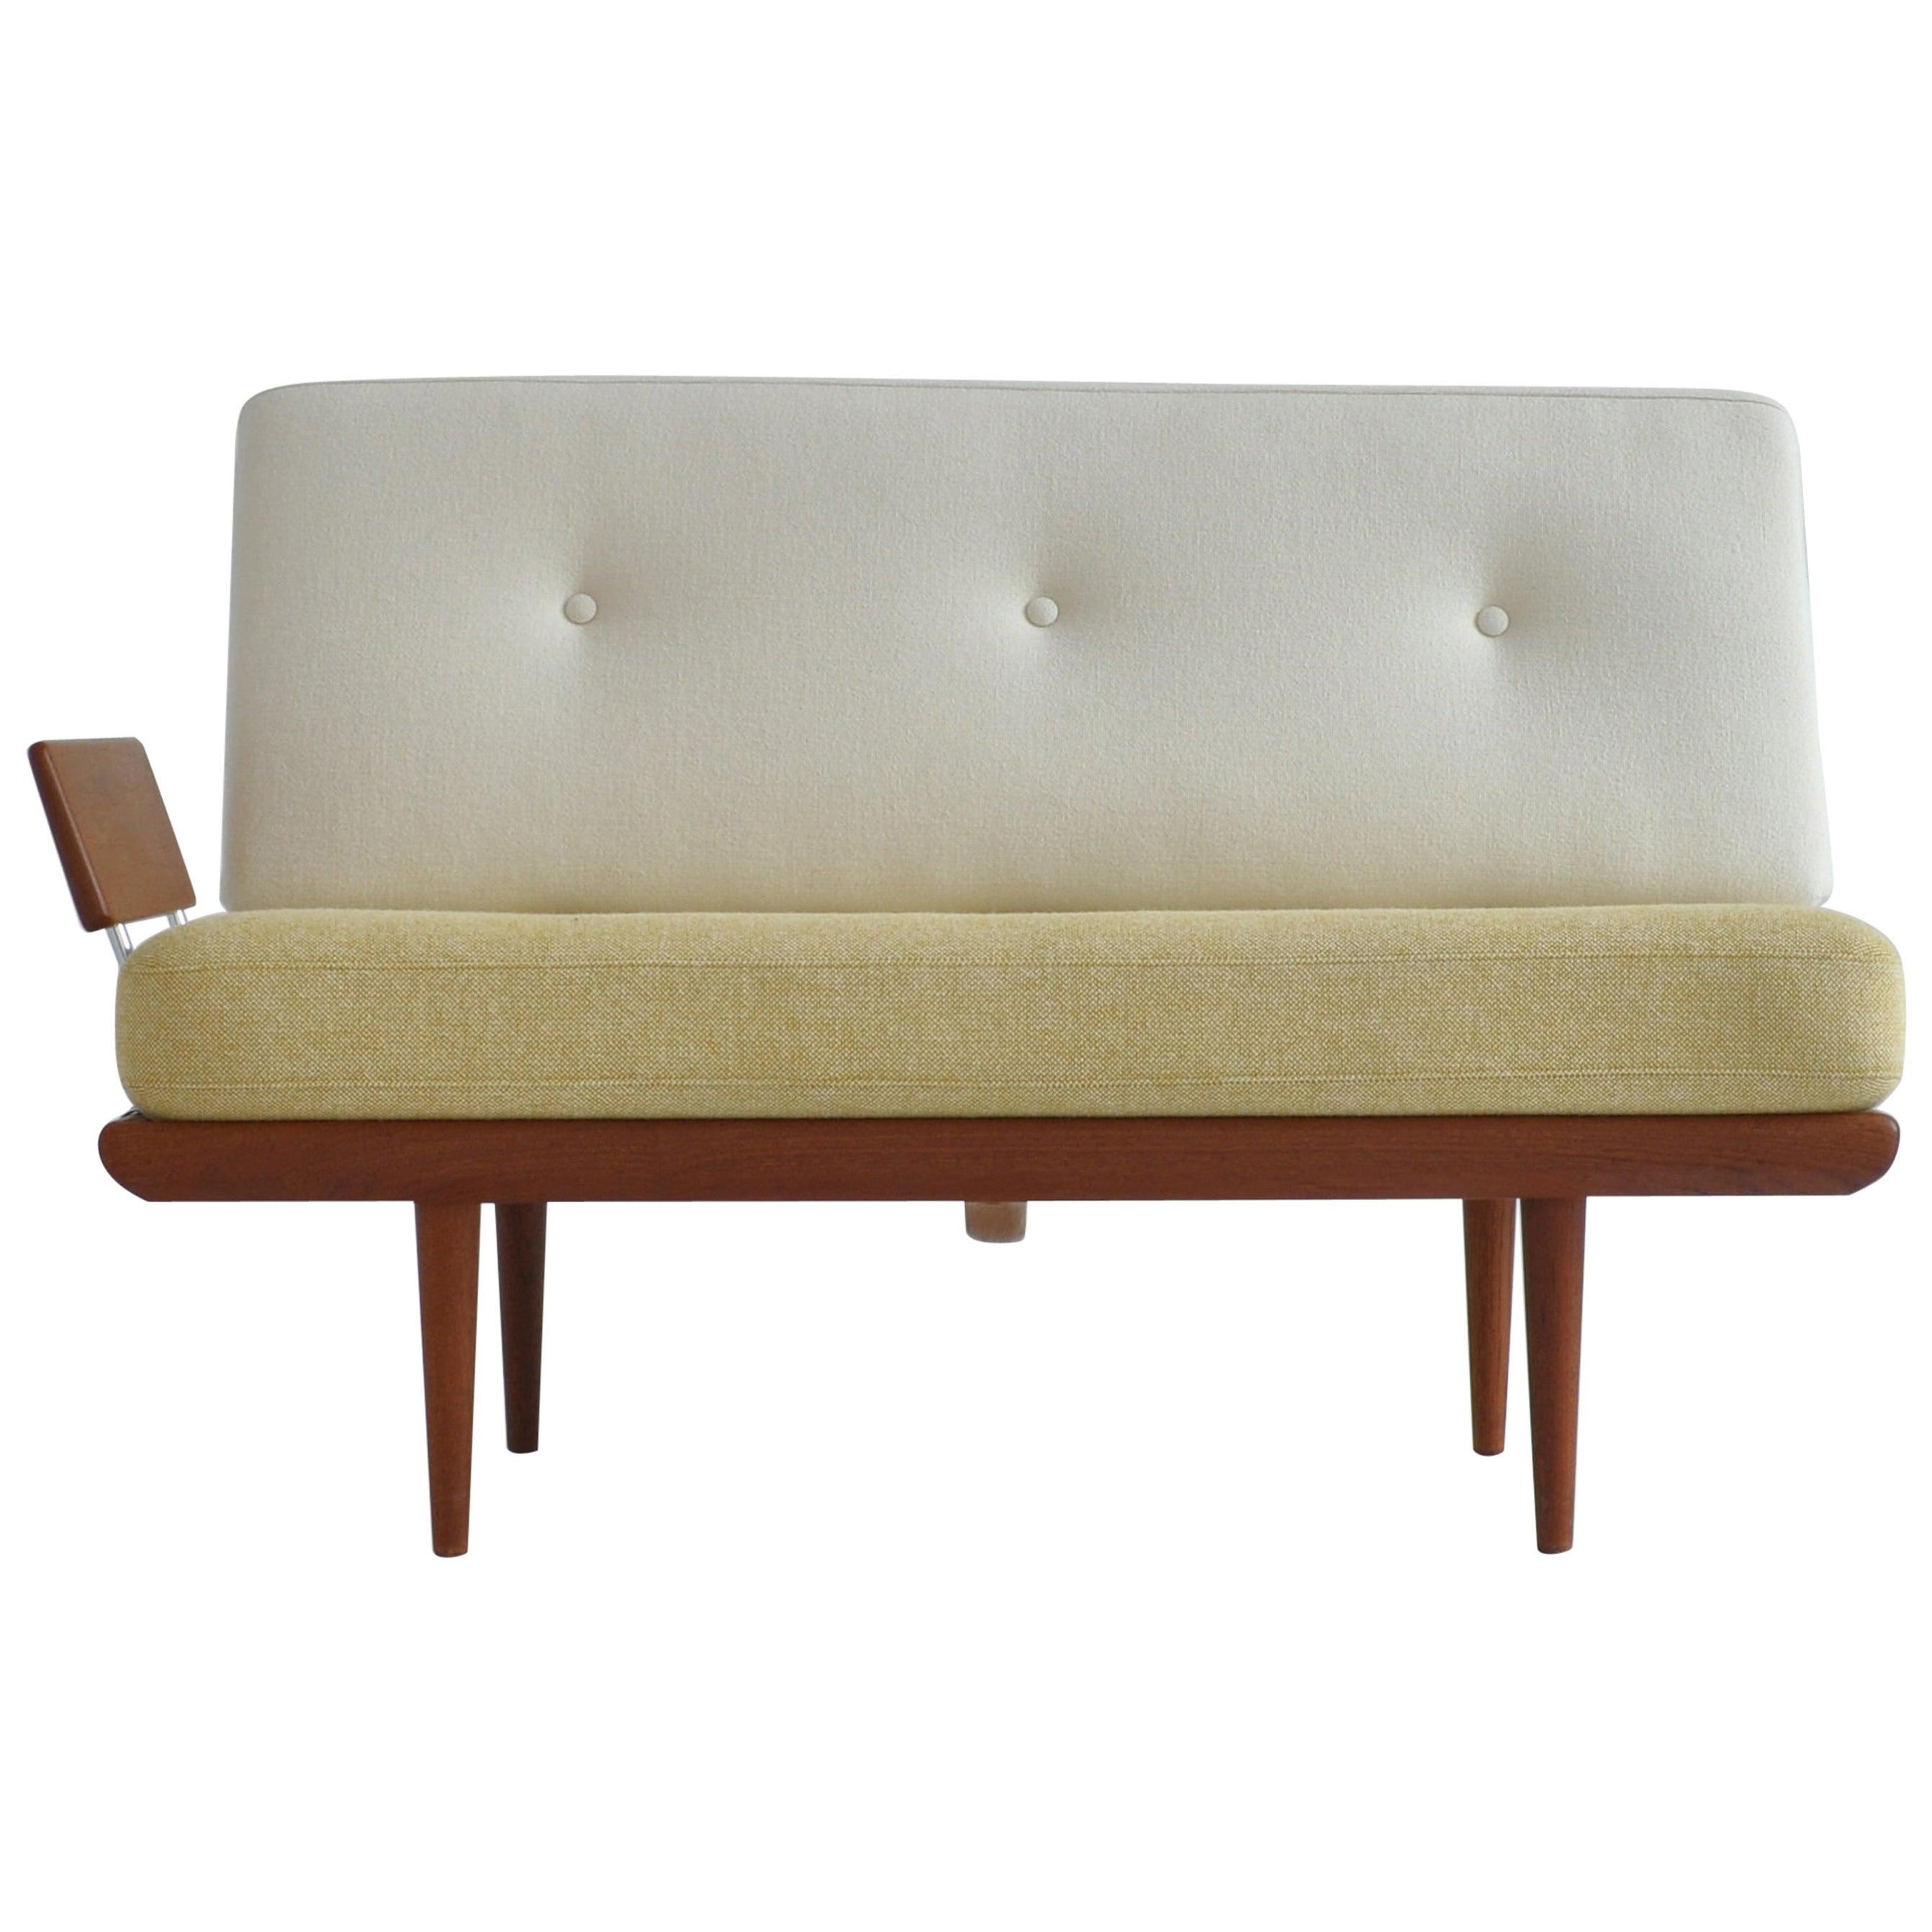 "Danish Modern Daybed or Sofa Model ""Minerva"" for France & Son, 1960s"